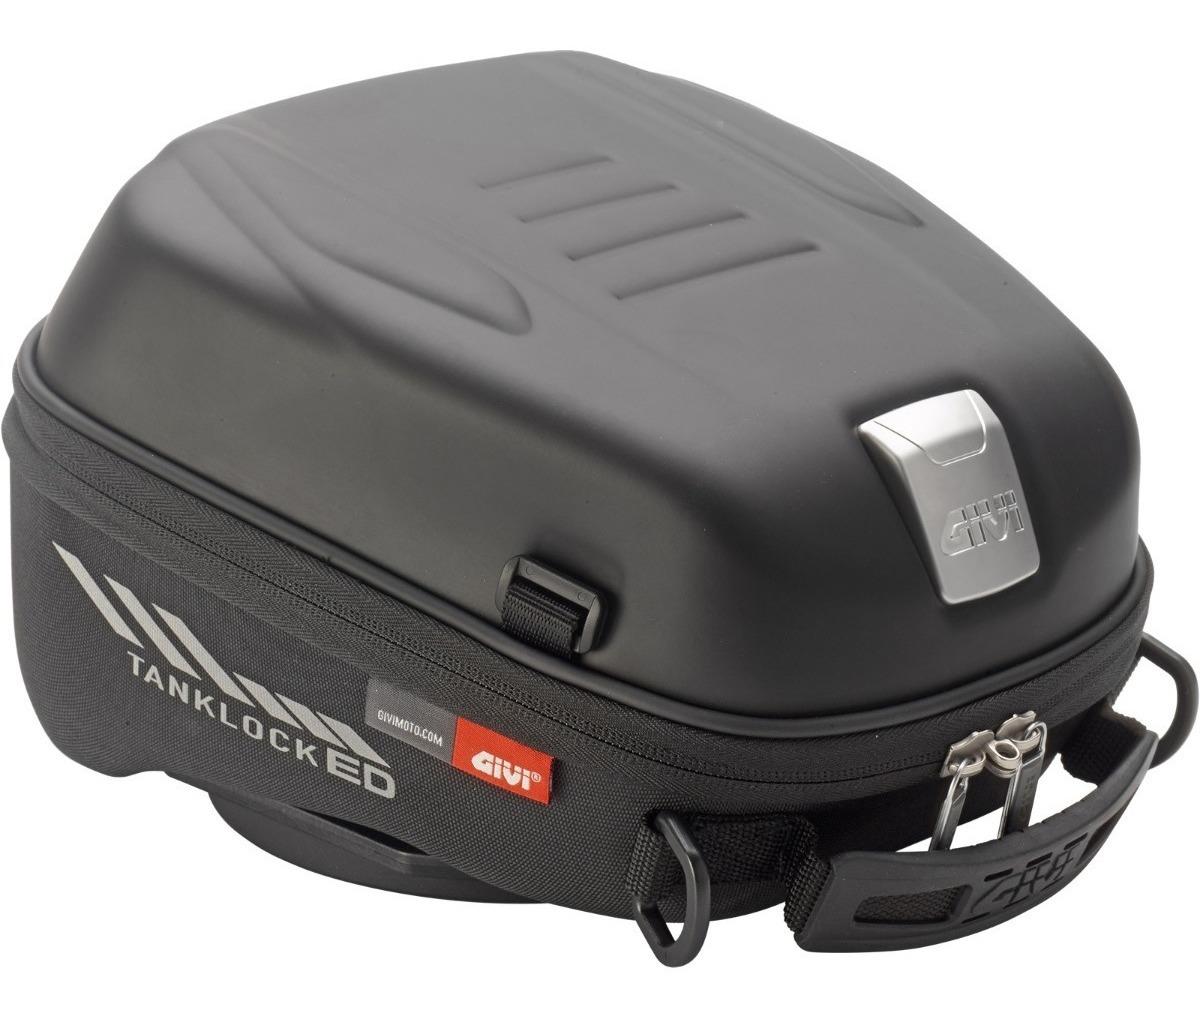 93efc35a783 Tankbag Tanklock Givi St605 Porta Celular 5 Litros - $ 495.000 en Mercado  Libre